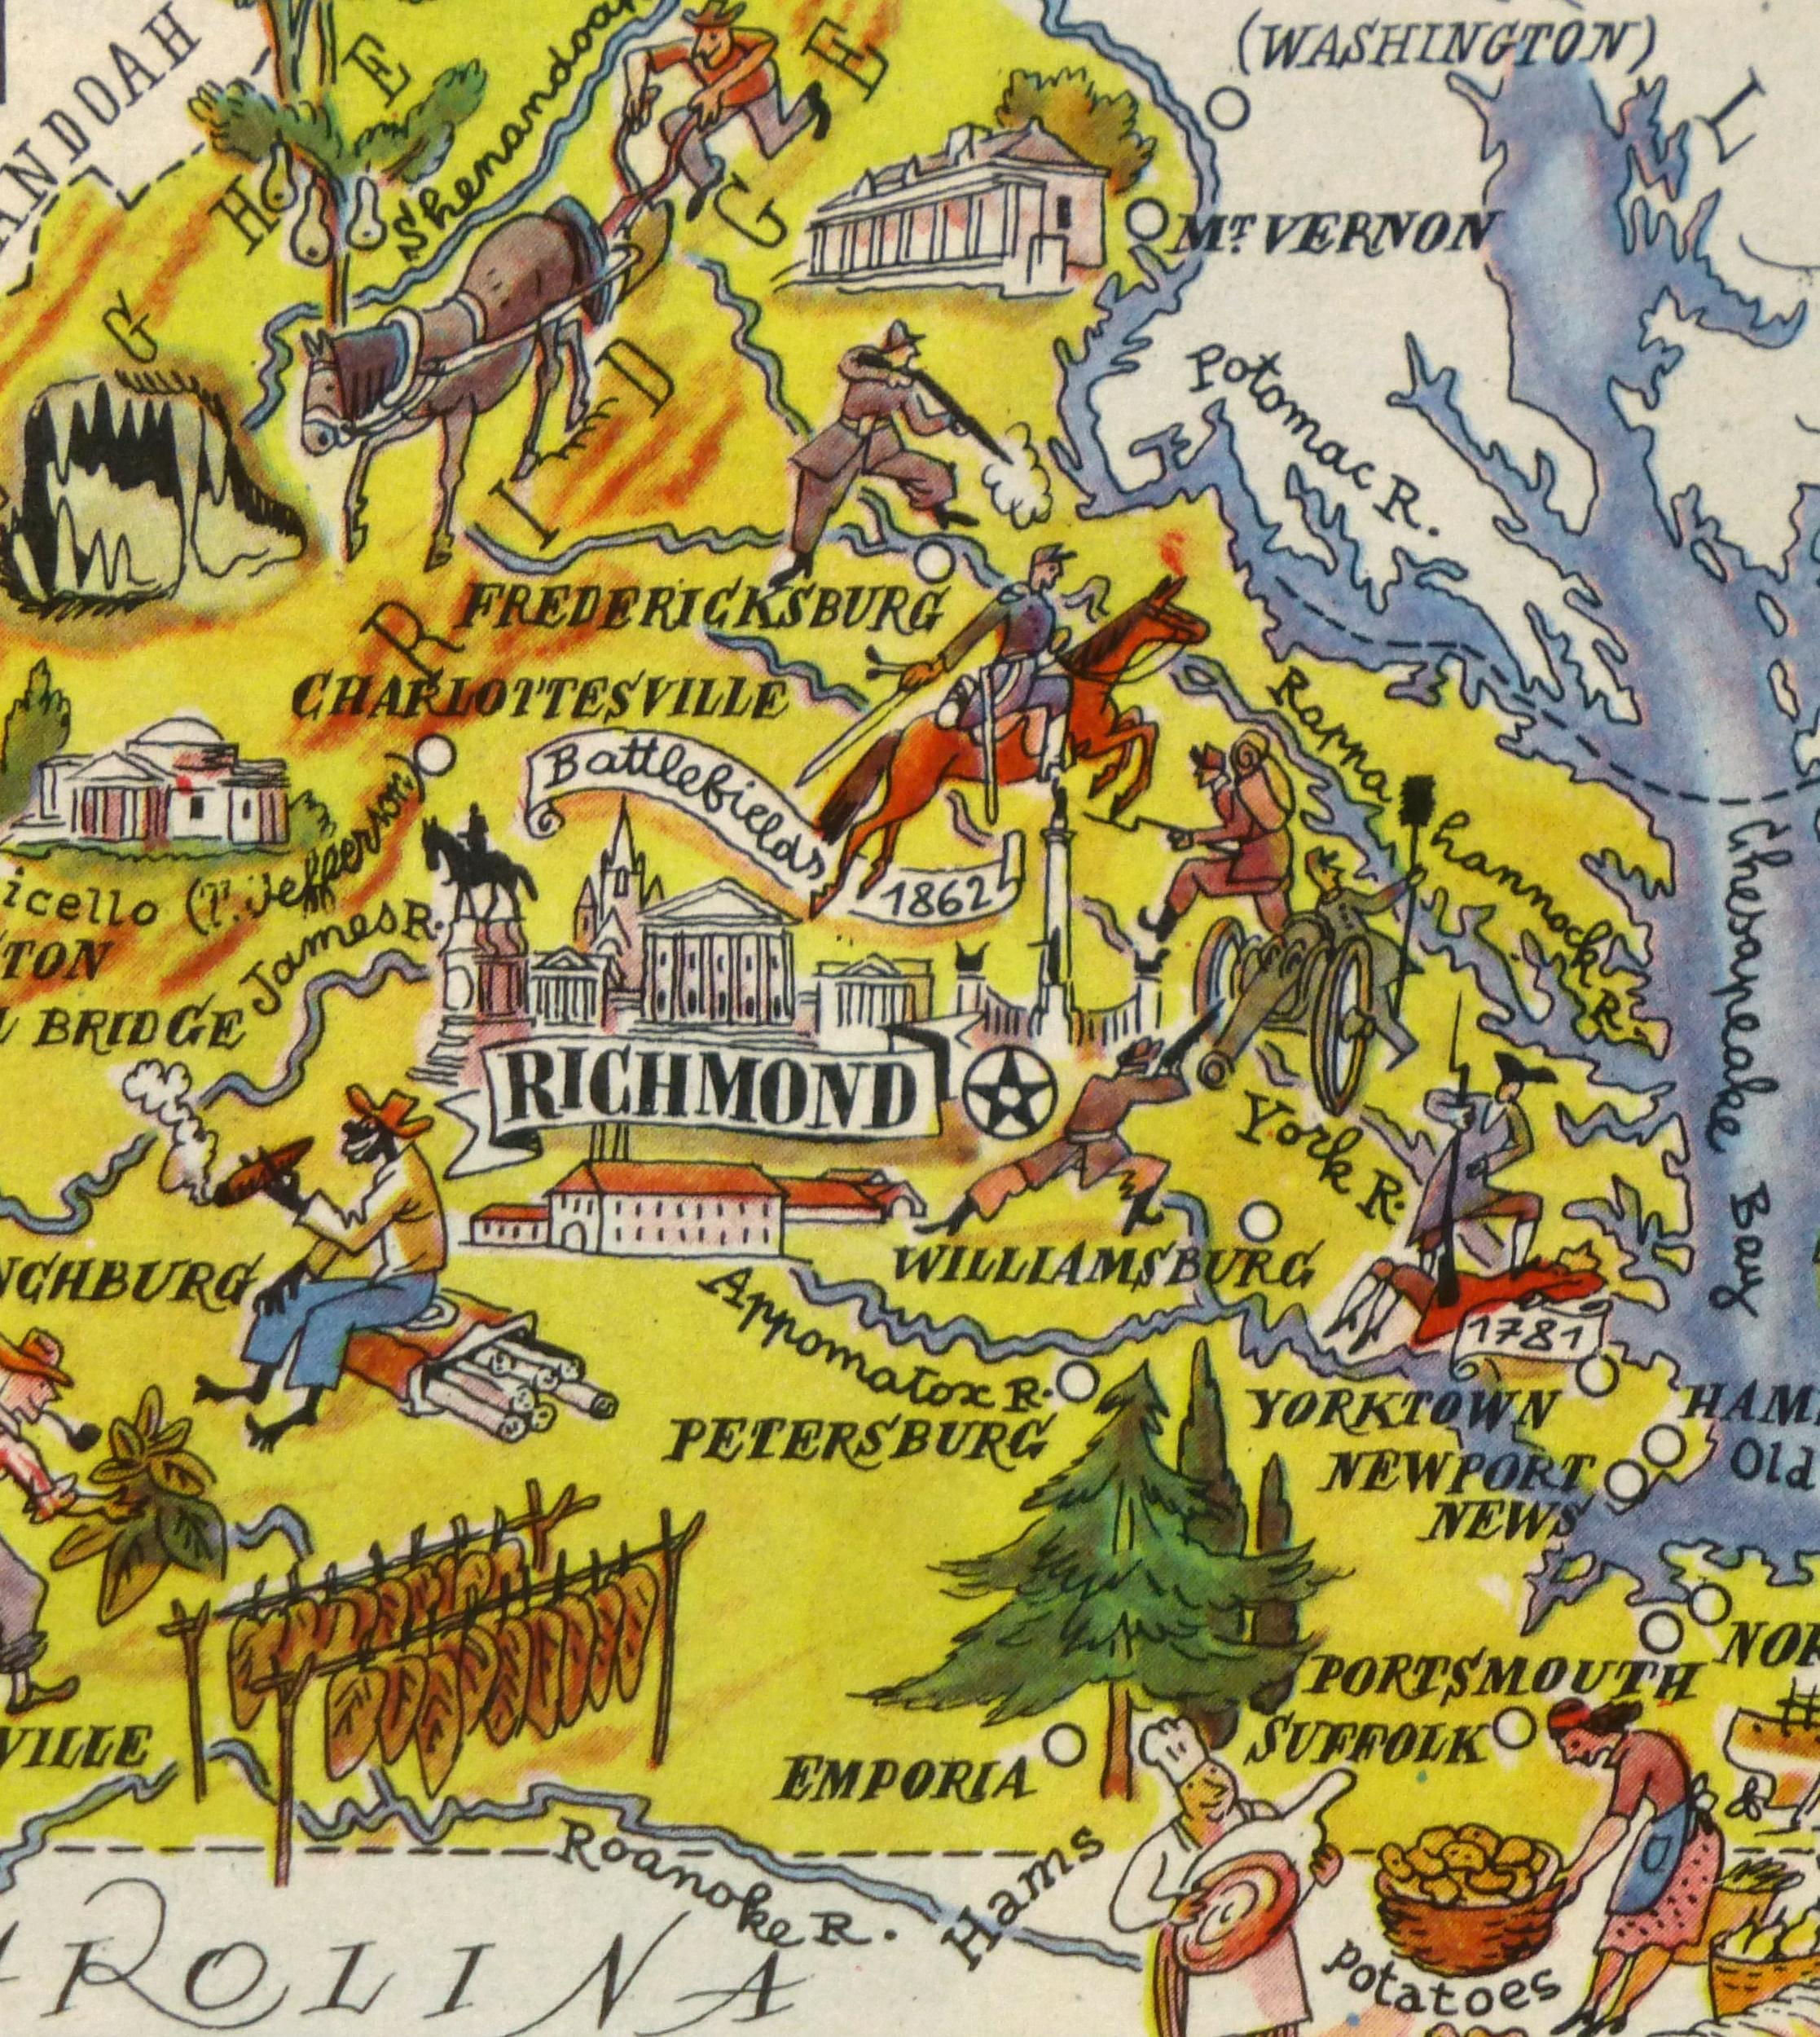 Virginia Pictorial Map, 1946-detail-6259K